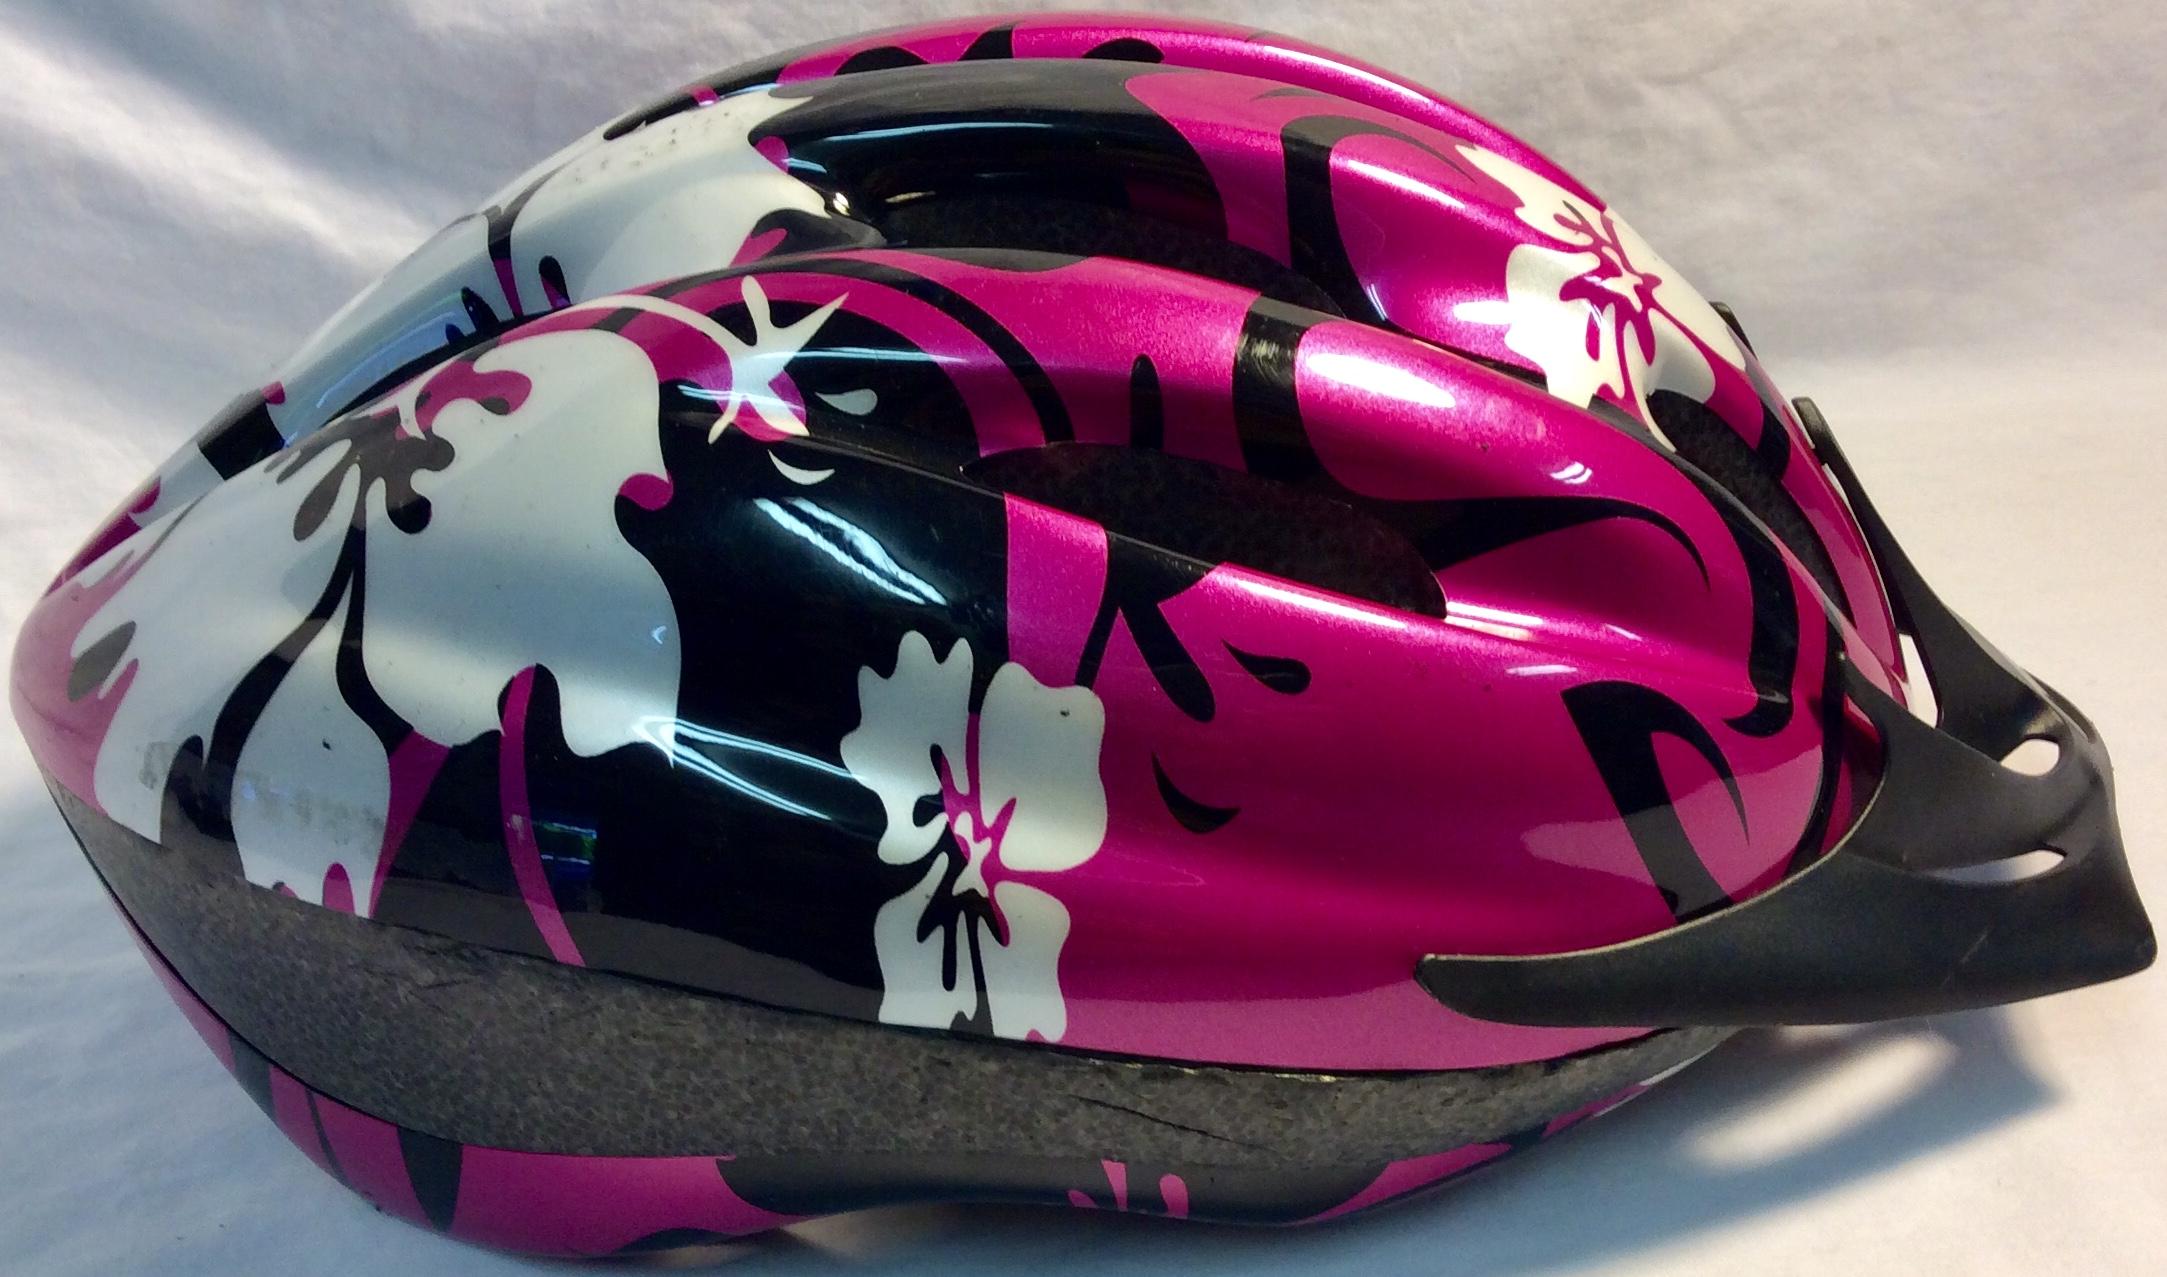 Bike helmet with flower details